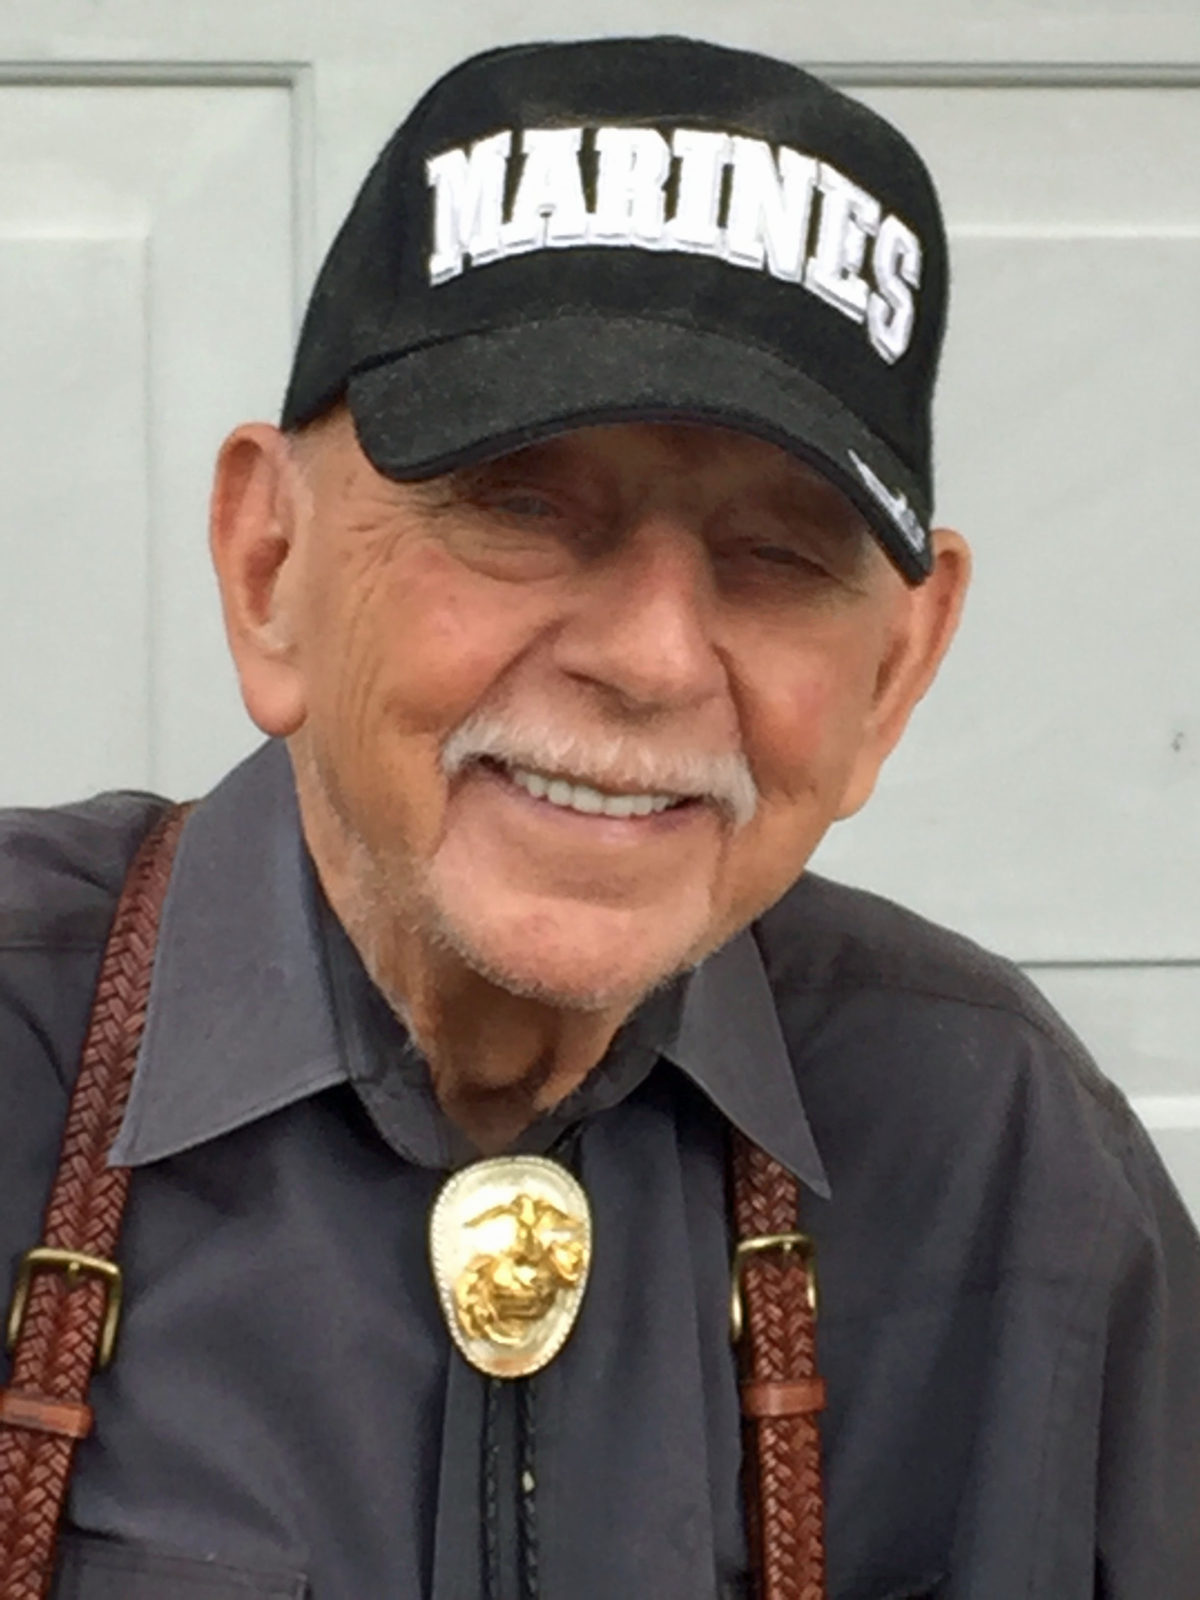 U.S. Marine Veteran Jerry Waxman and Inveterate Designer